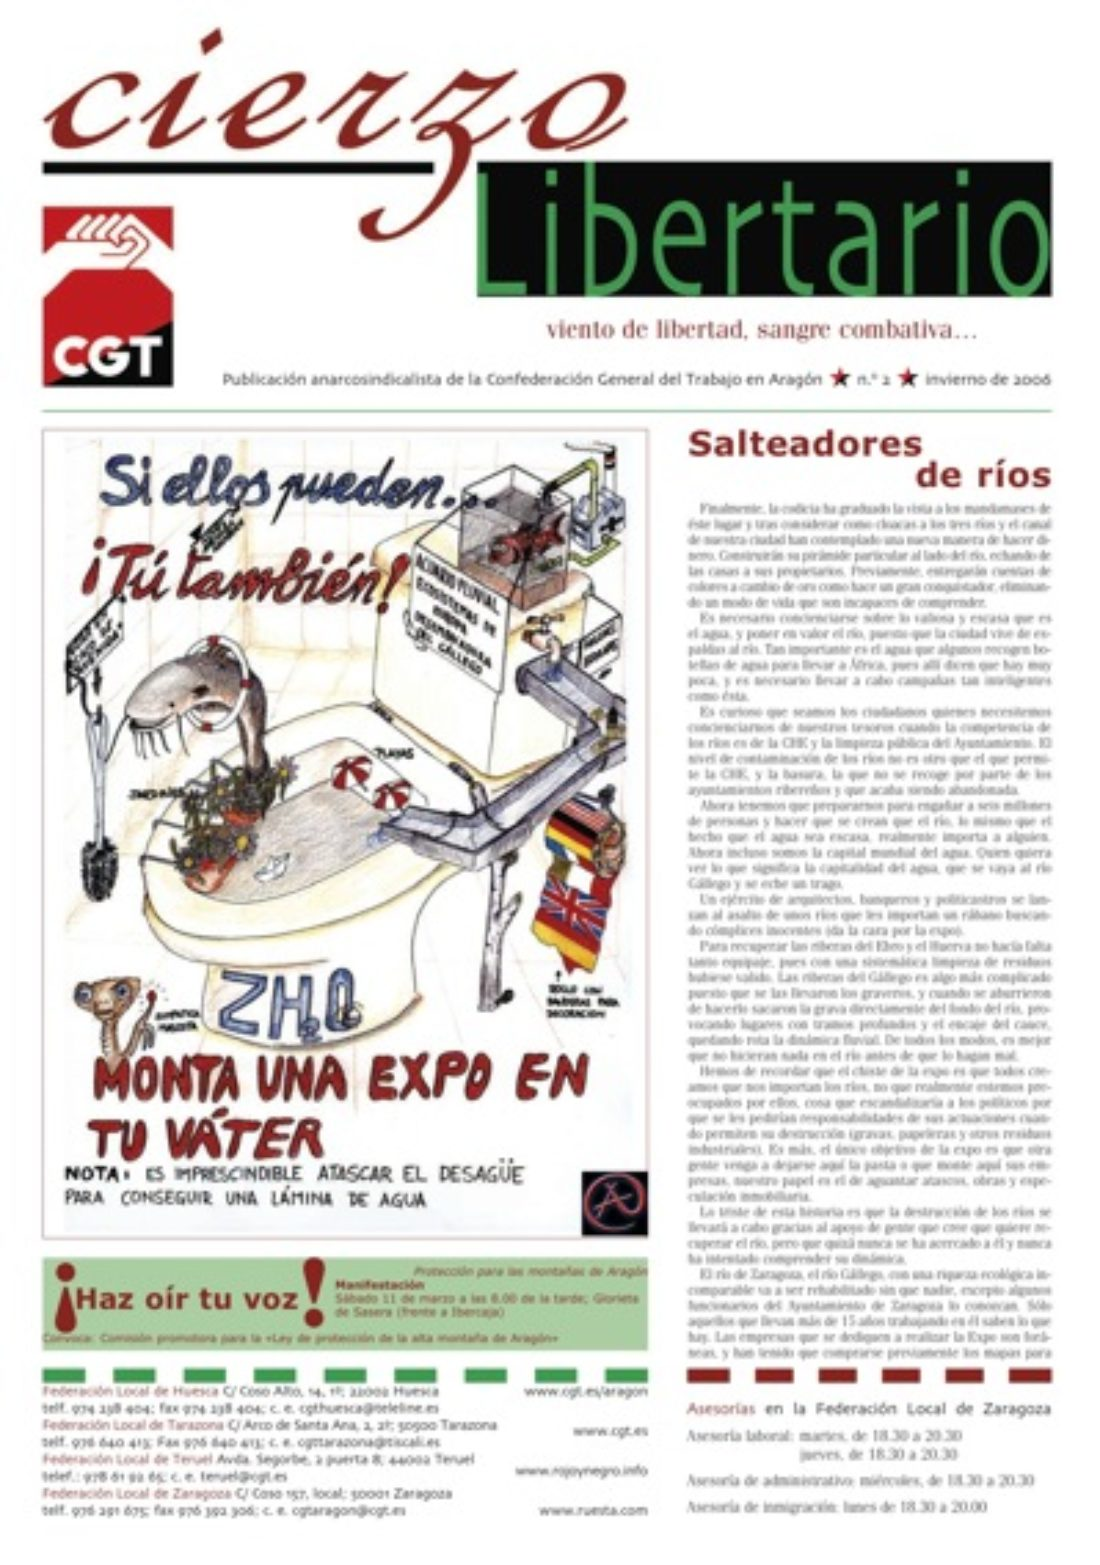 Cierzo Libertario nº2 – otoño 2006